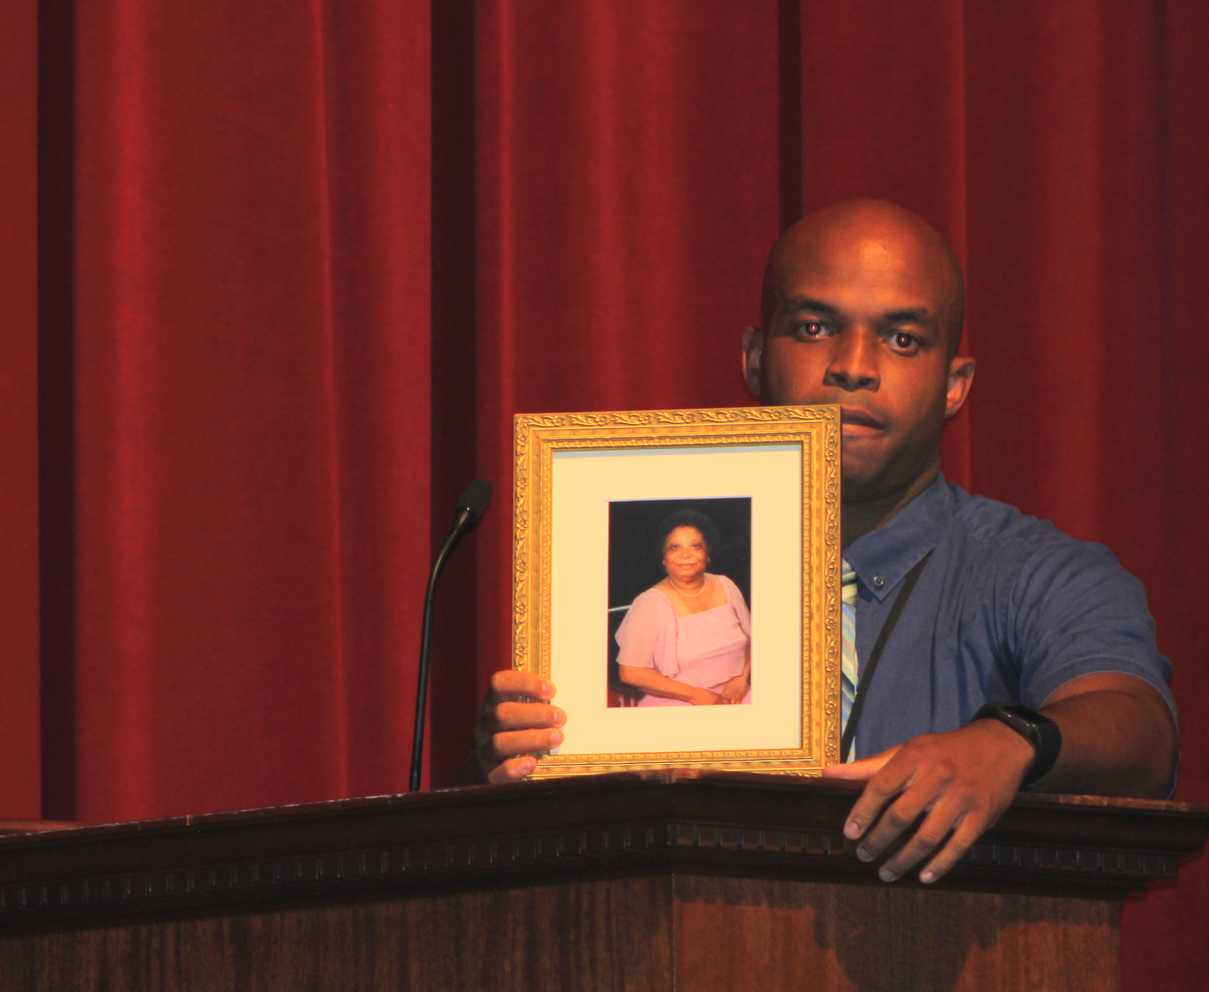 The Raymond J. Sachs, Sr. '25 Award recipient Craig White attributing his success to his late grandmother.